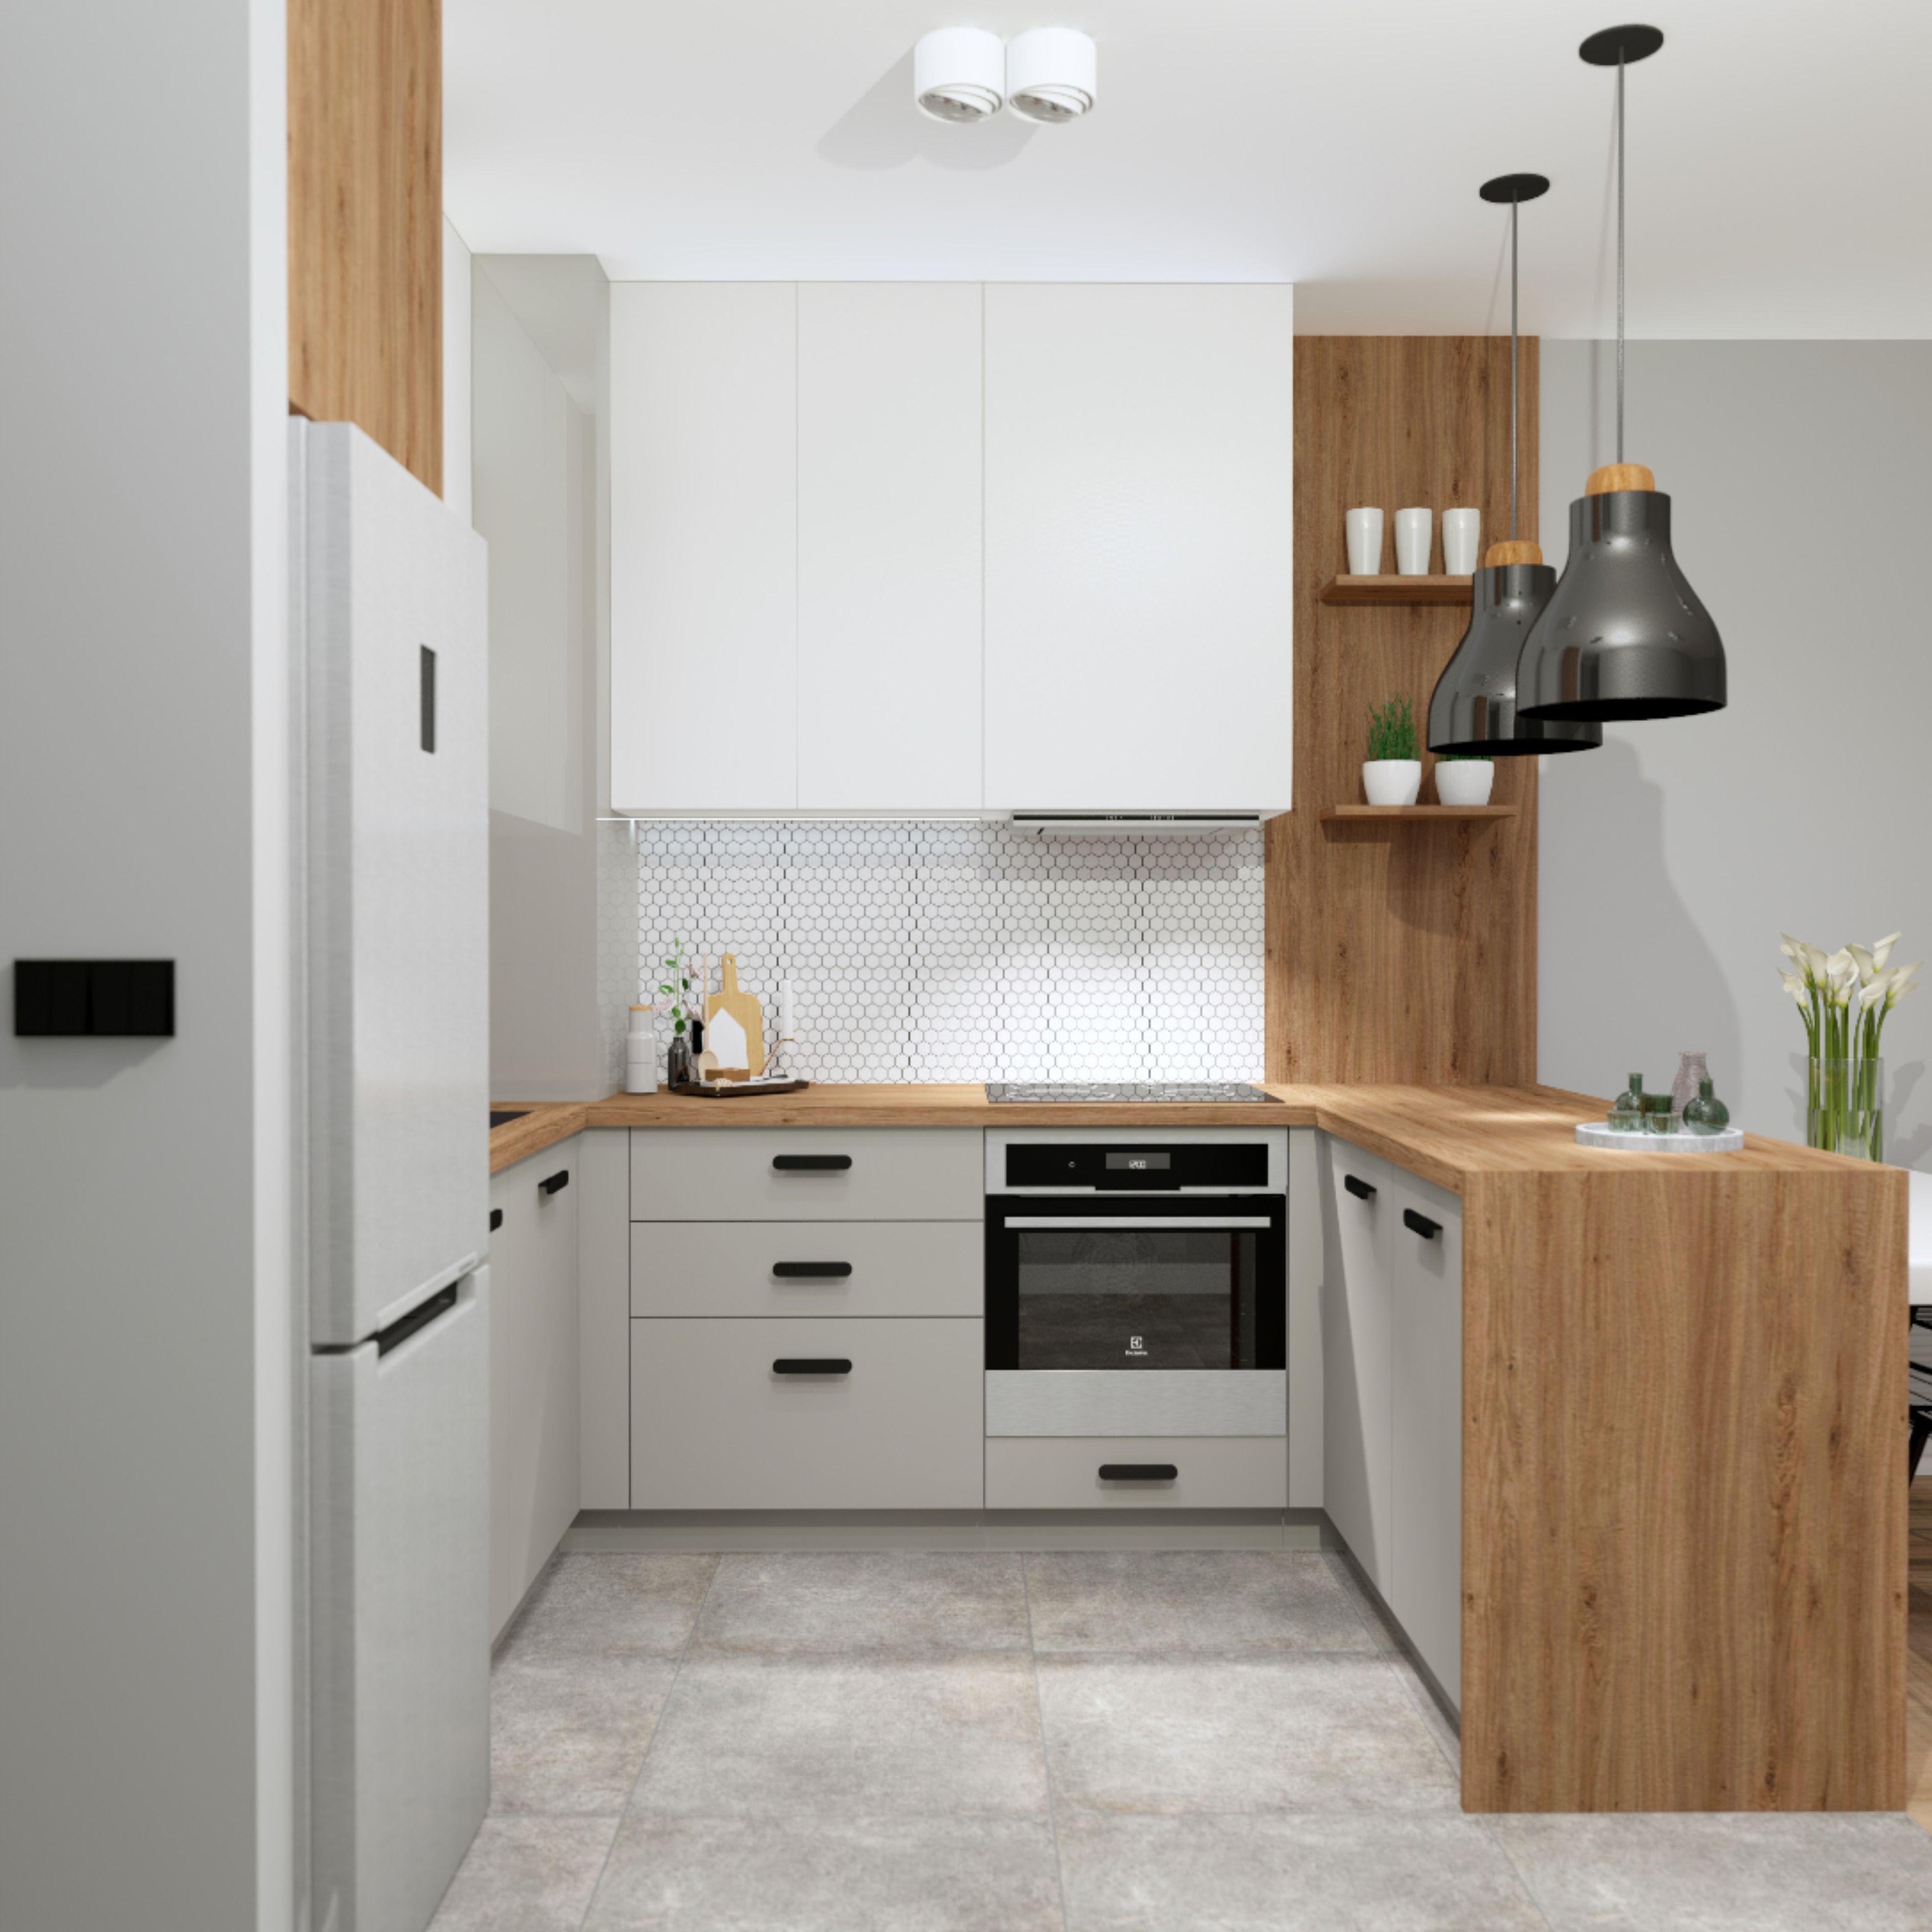 Interriordesign Kitchen Wood Mozaika Kuchnia Projekt Wnetrza Szarosci Meble Na Wymiar Kitchen Home Home Decor